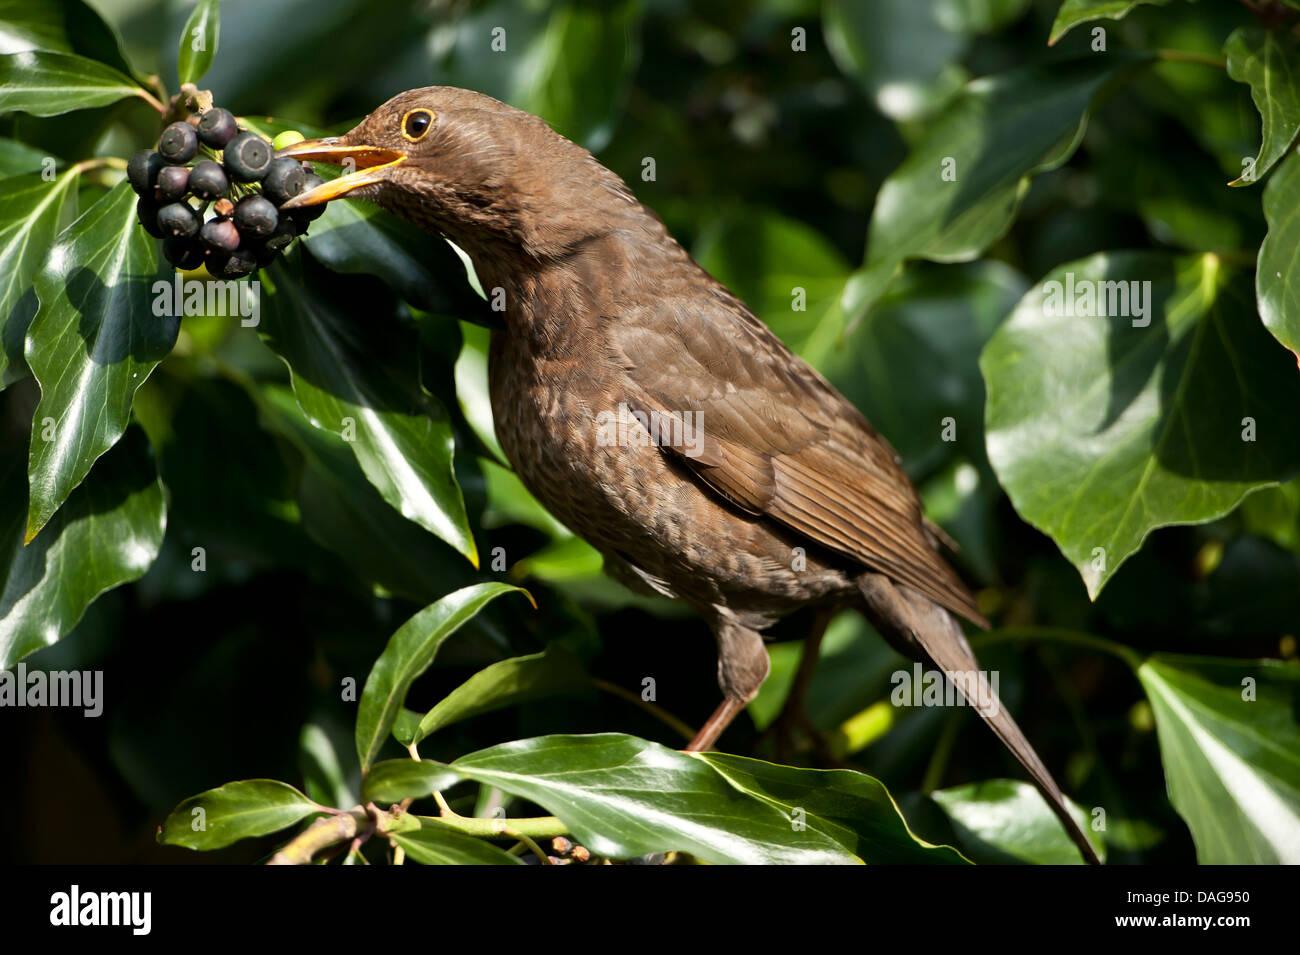 blackbird (Turdus merula), female feeding on ivy berries, Germany, North Rhine-Westphalia - Stock Image